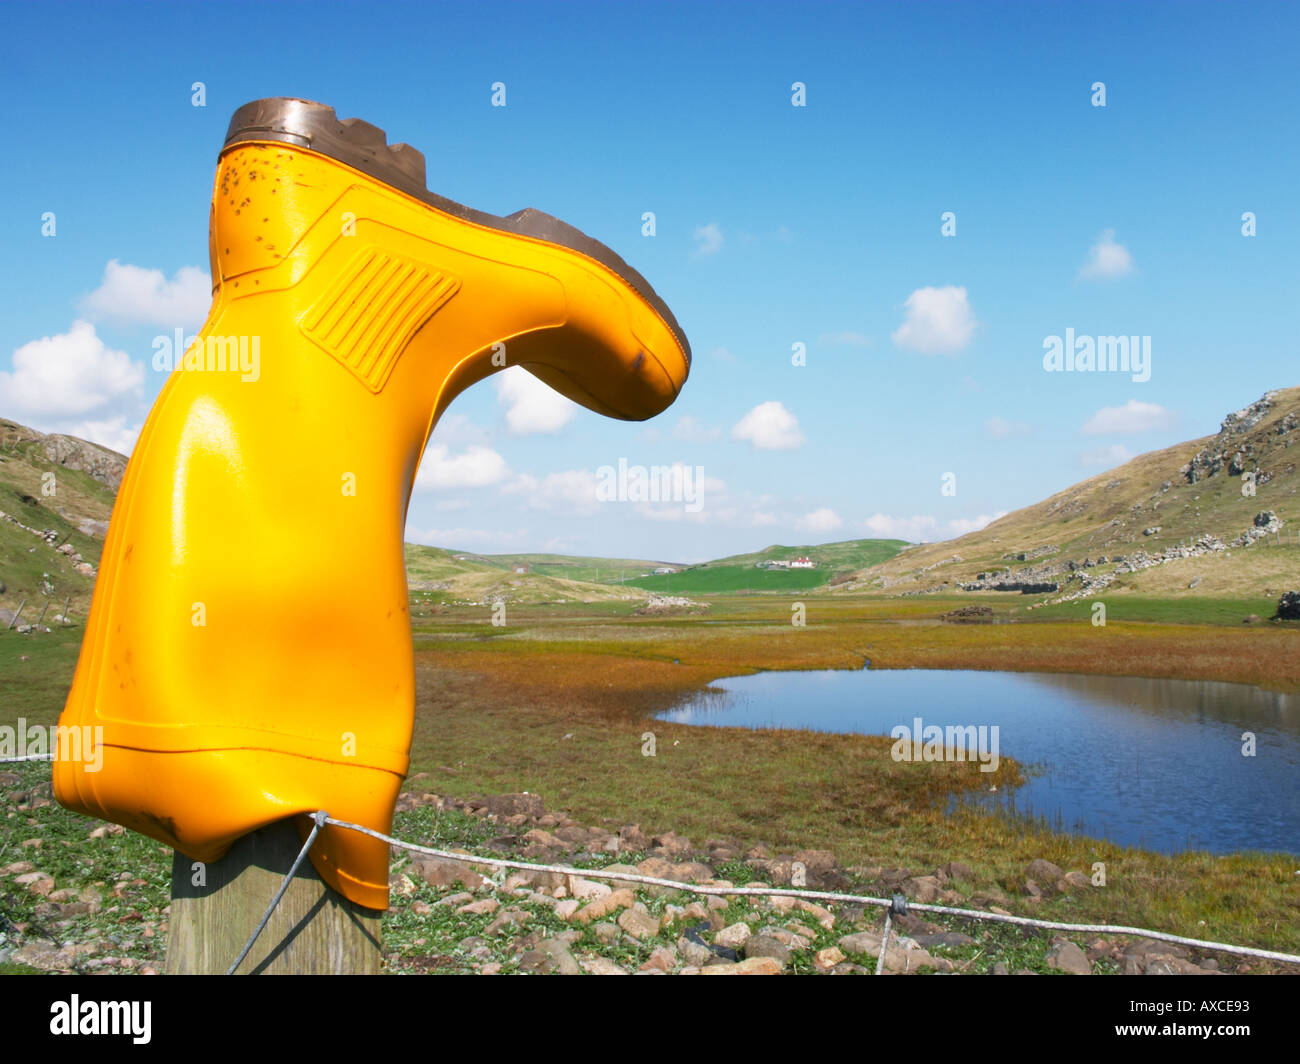 Yellow Welly Boot Culswick Shetland Stock Photo